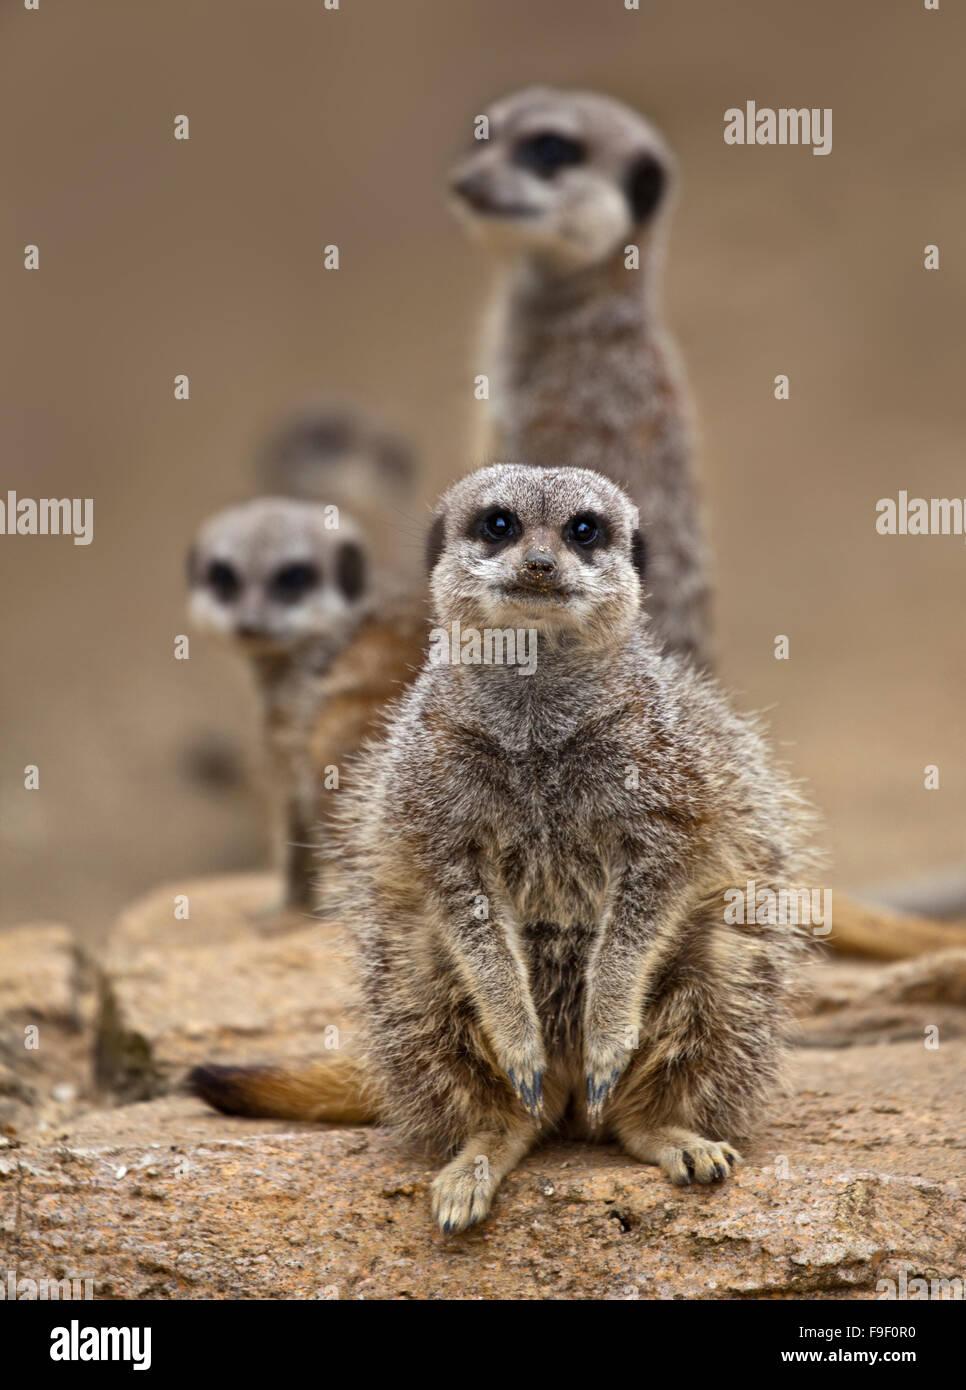 Group of Slender Tailed Meerkats (suricata suricatta) - Stock Image